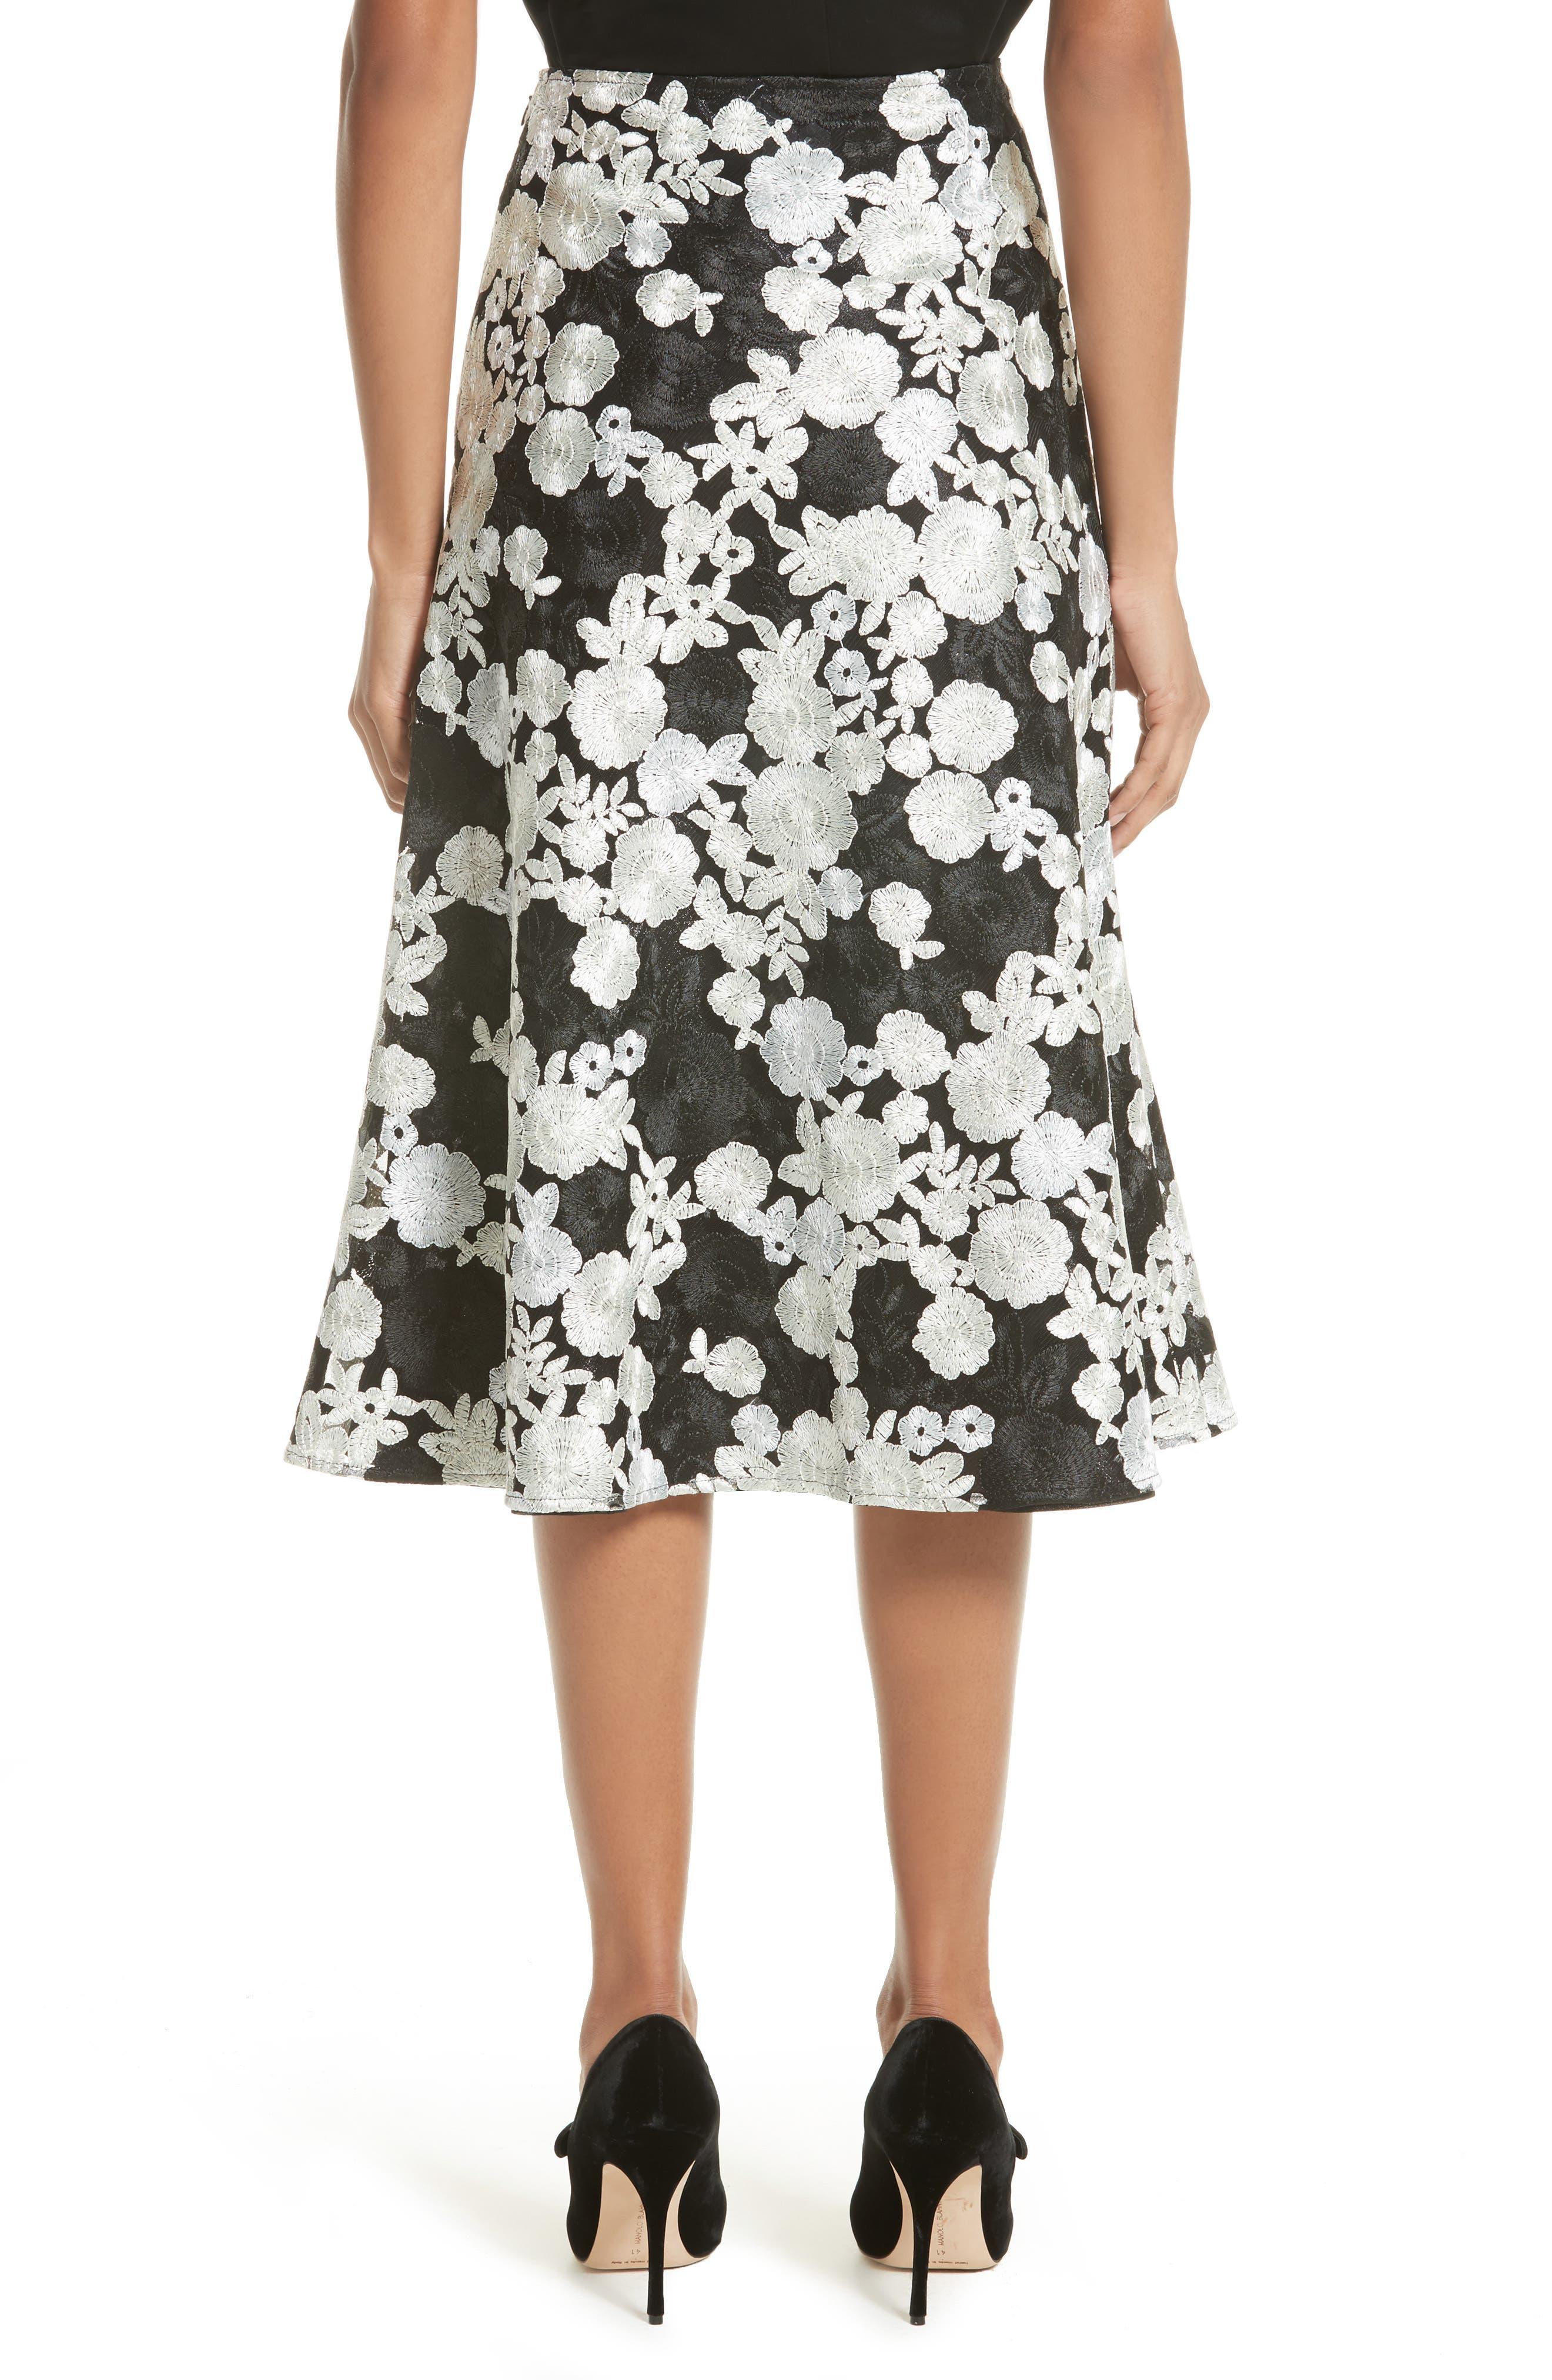 St. John Floral Embroidered Flared Skirt,                             Alternate thumbnail 2, color,                             Caviar Multi